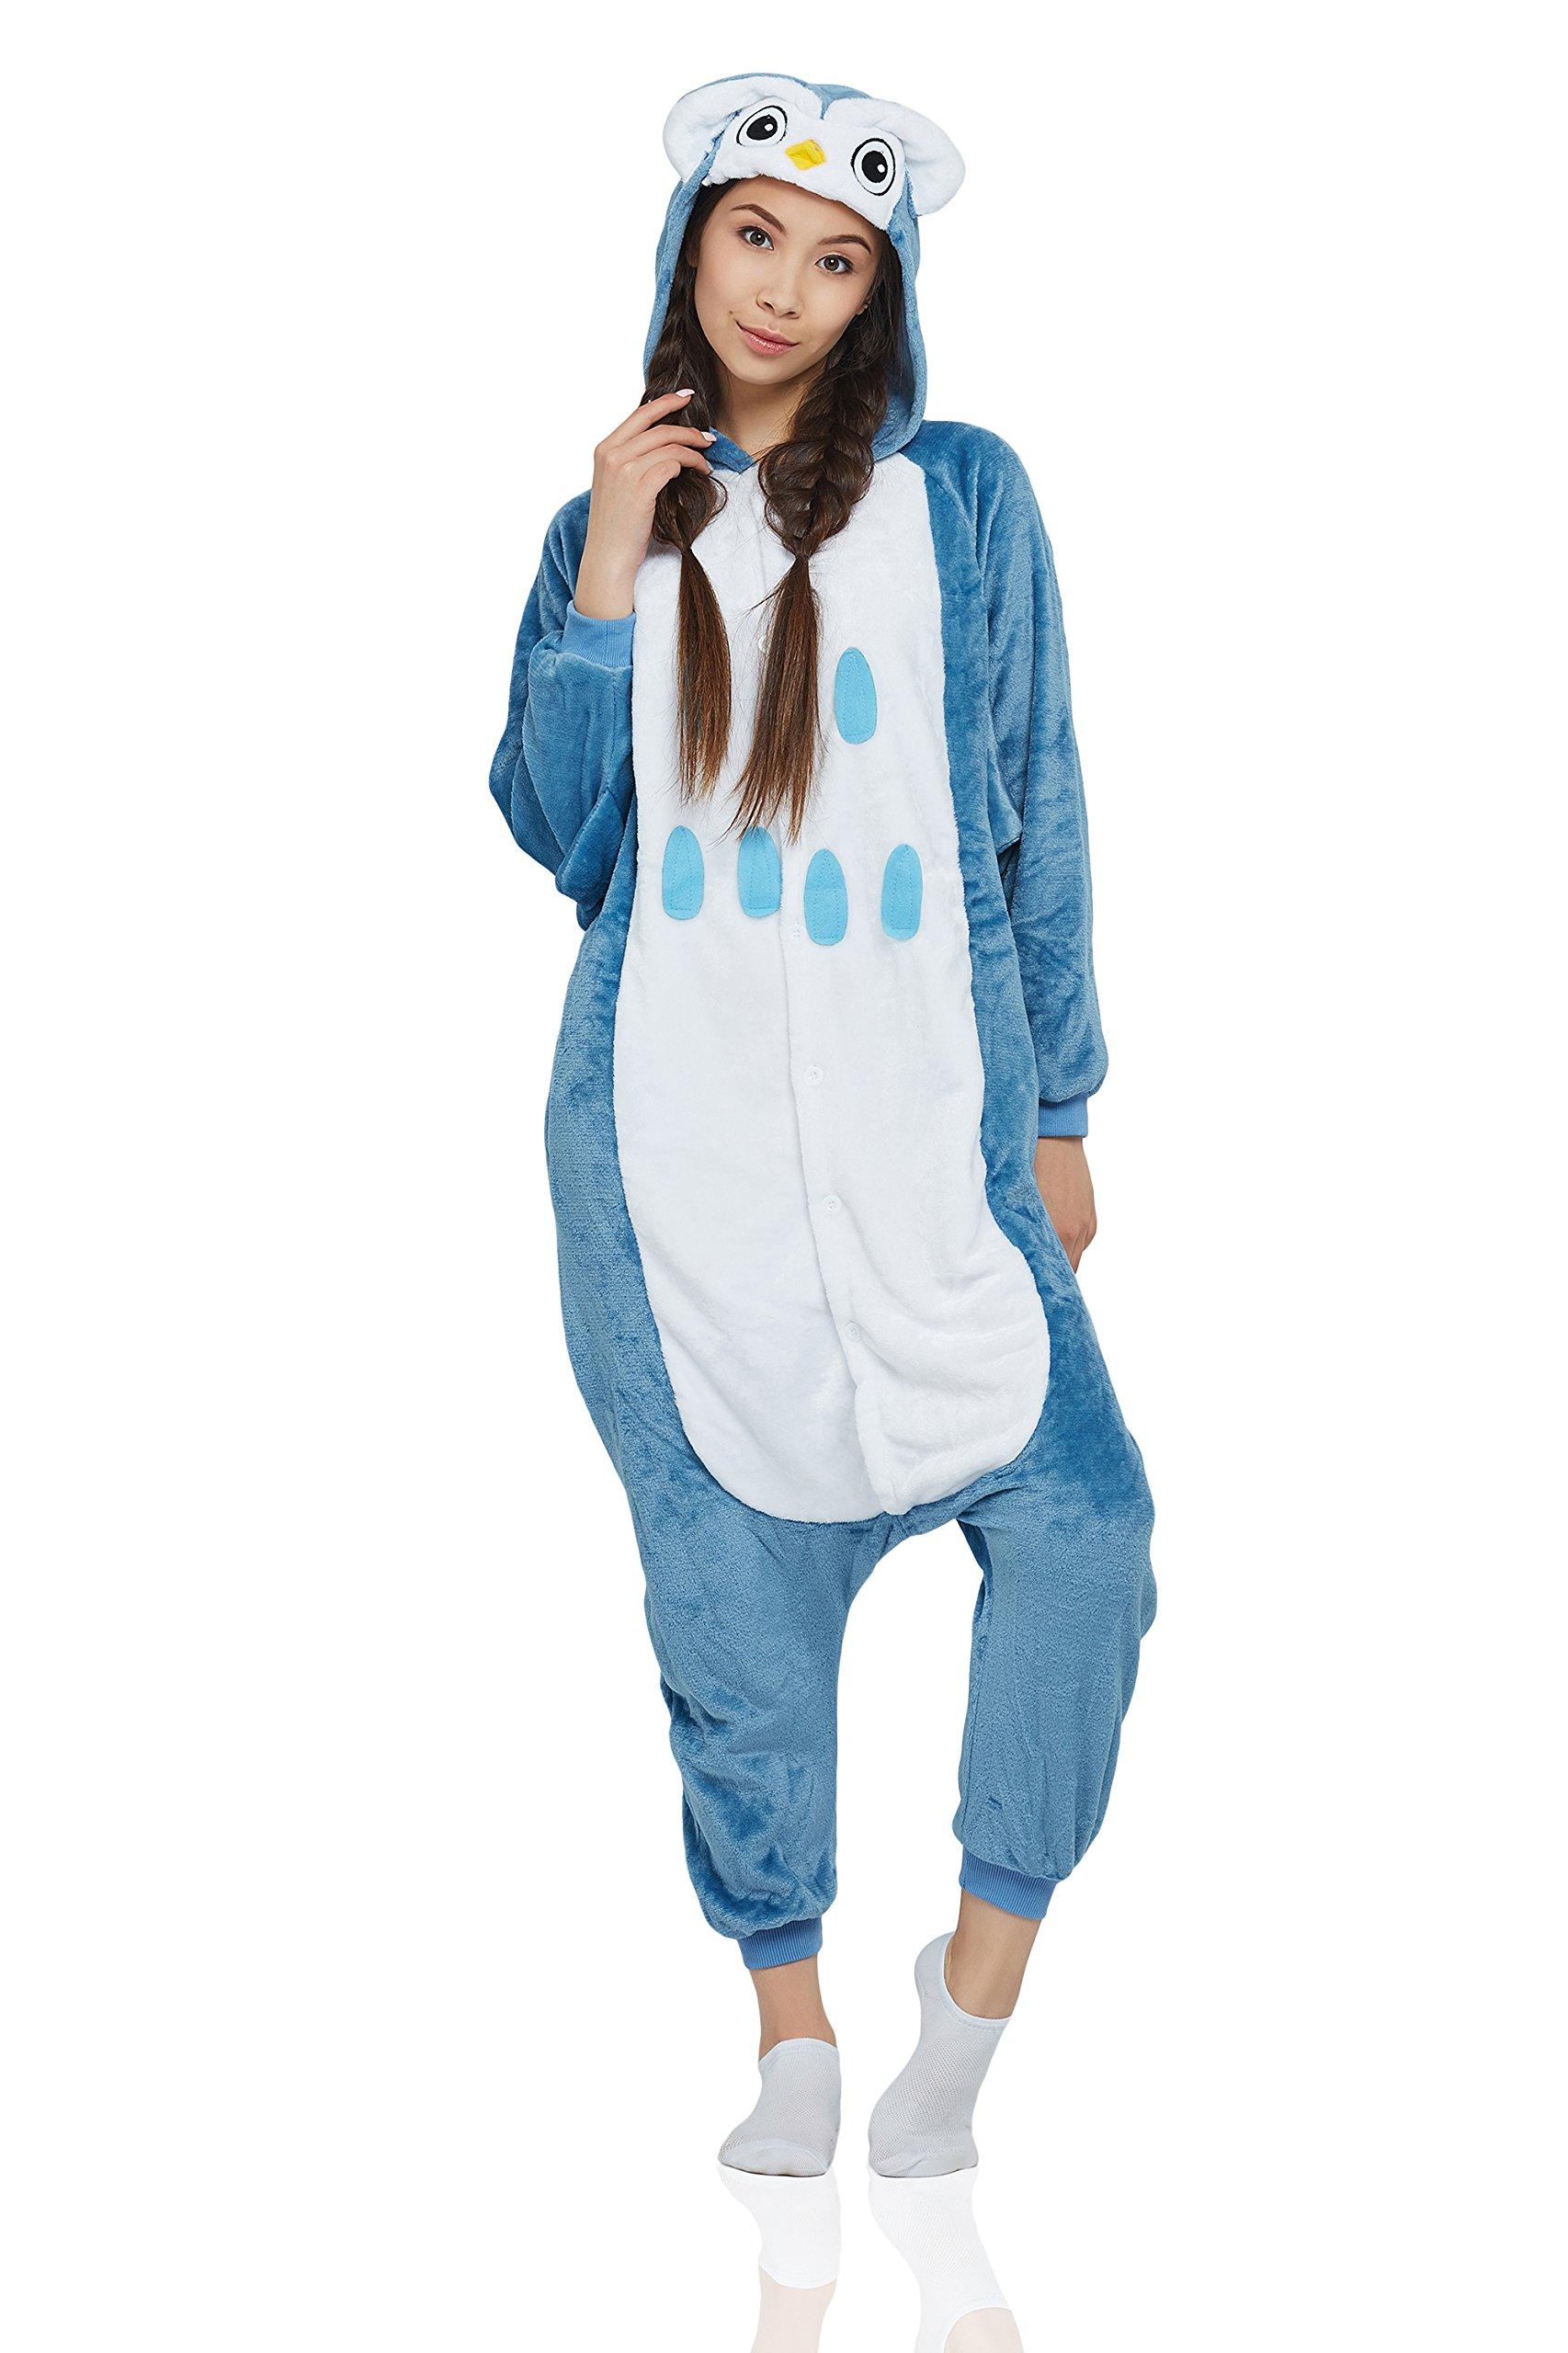 Nothing But Love Adult Owl Kigurumi Animal Onesie Pajamas Plush Onsie One Piece Cosplay Costume (Small, Dark Blue, White)